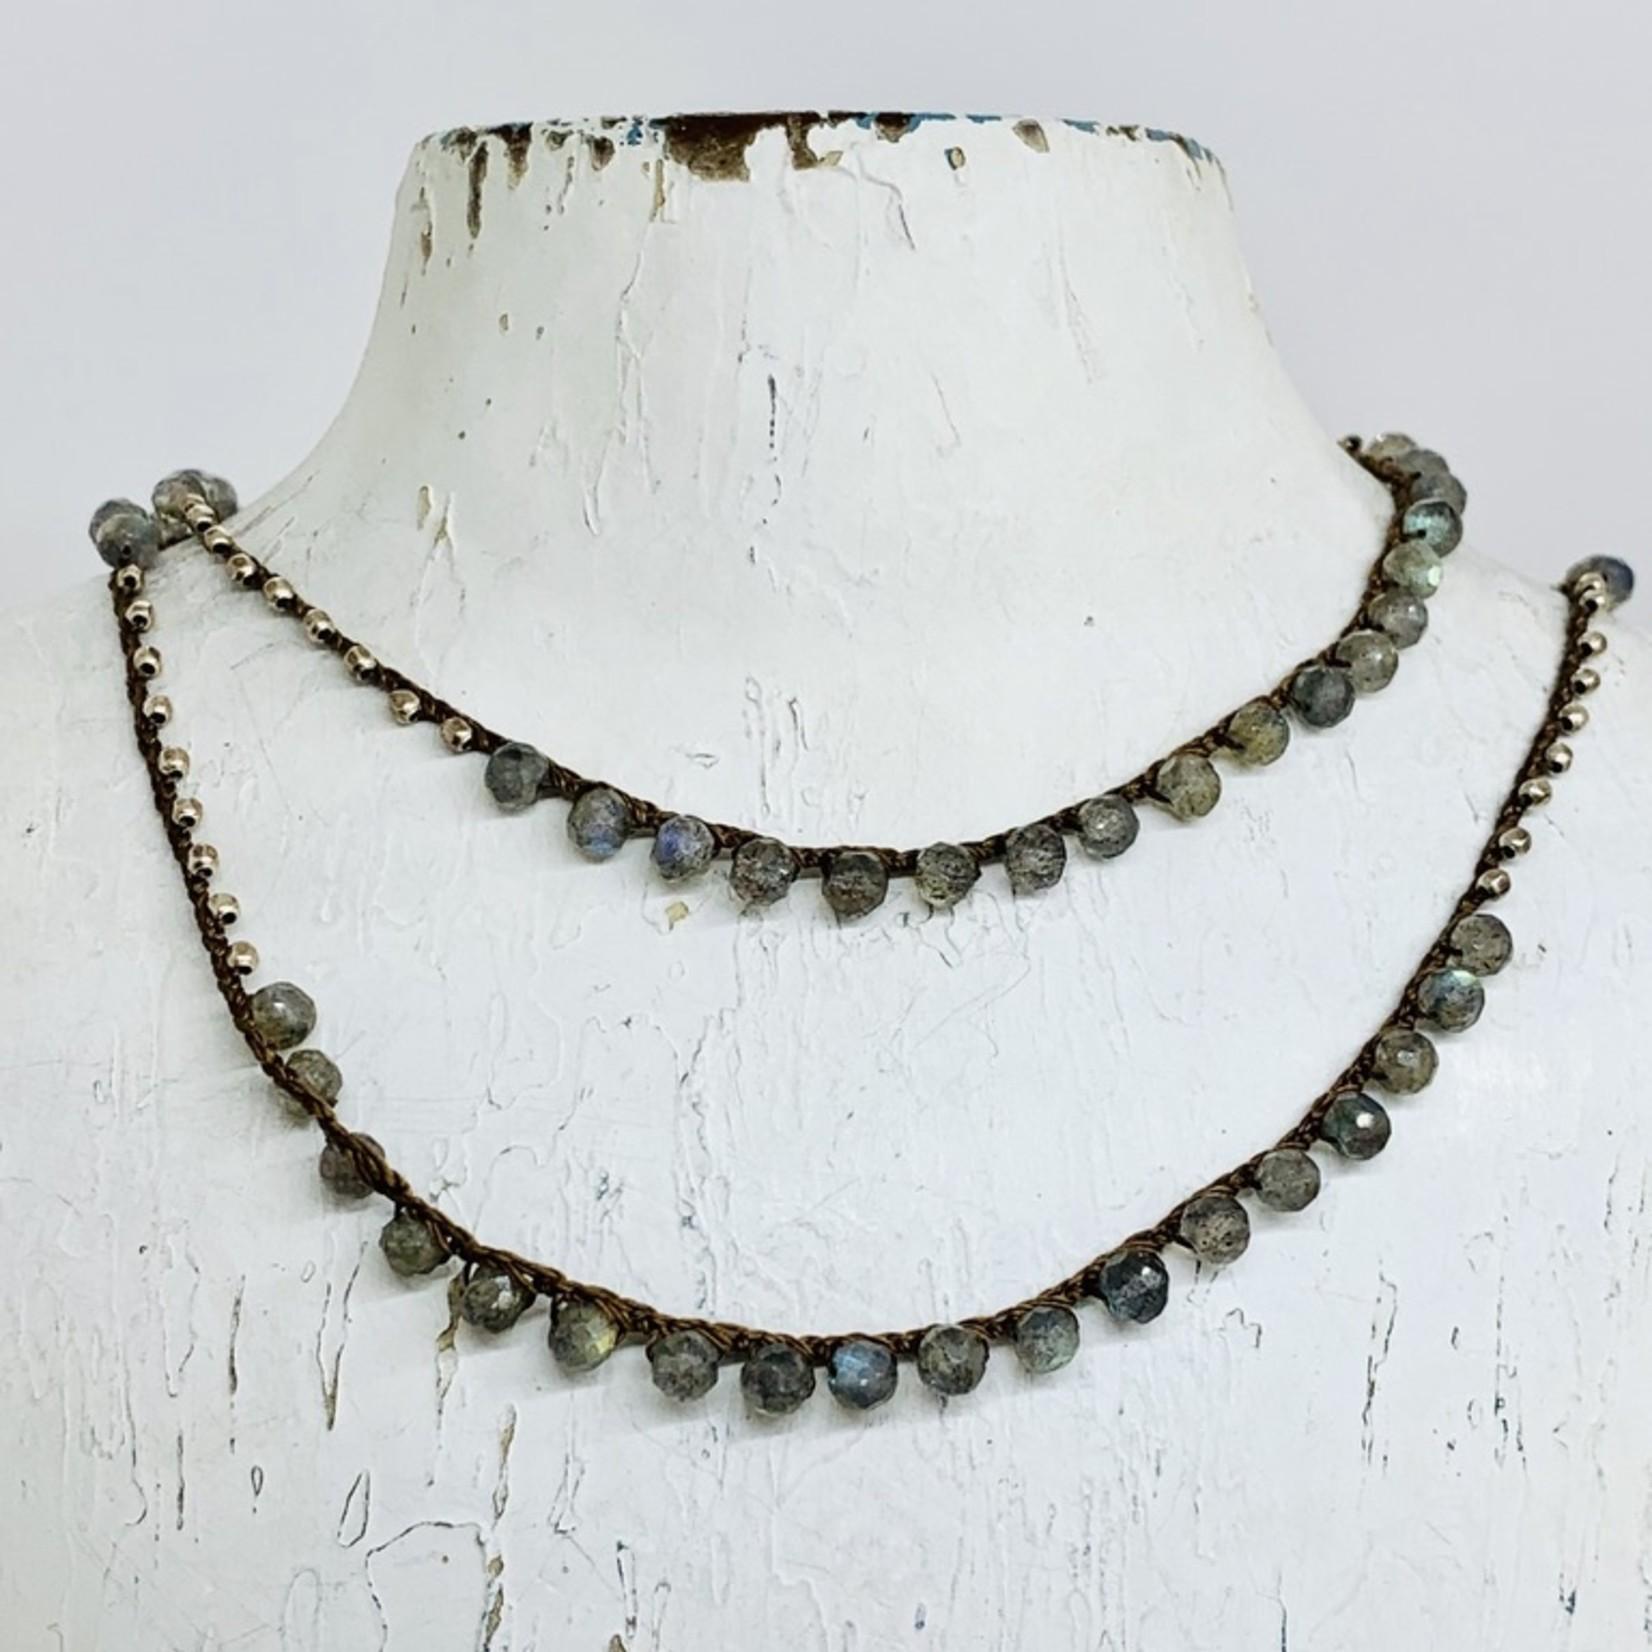 "Native Gems LABRADORITE + PYRITE sterling silver wrap-necklace, 32"" w/14k GF clasp"